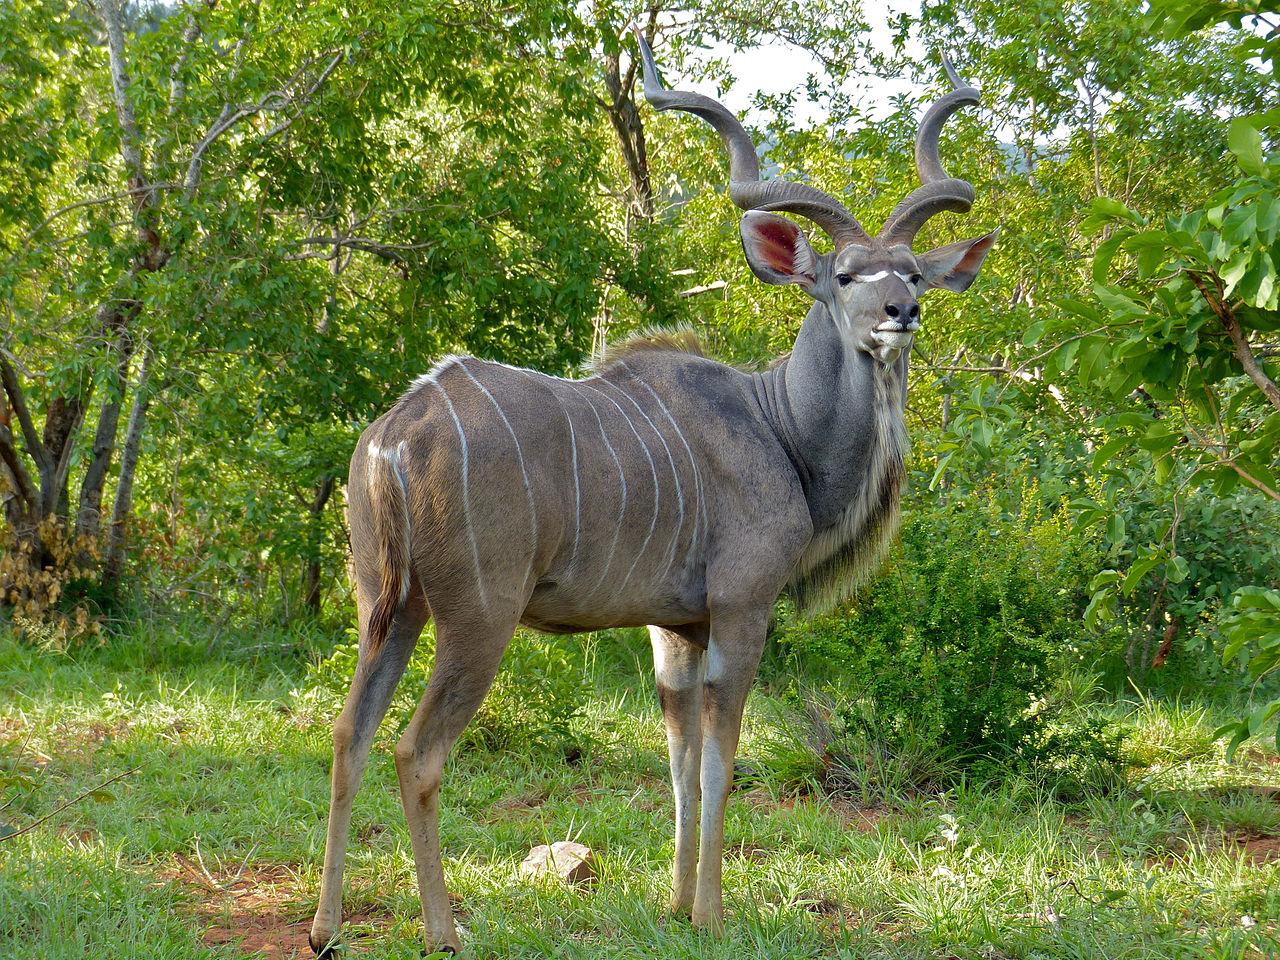 1280px-Greater_Kudu_%28Tragelaphus_strepsiceros%29_%2811802253775%29.jpg